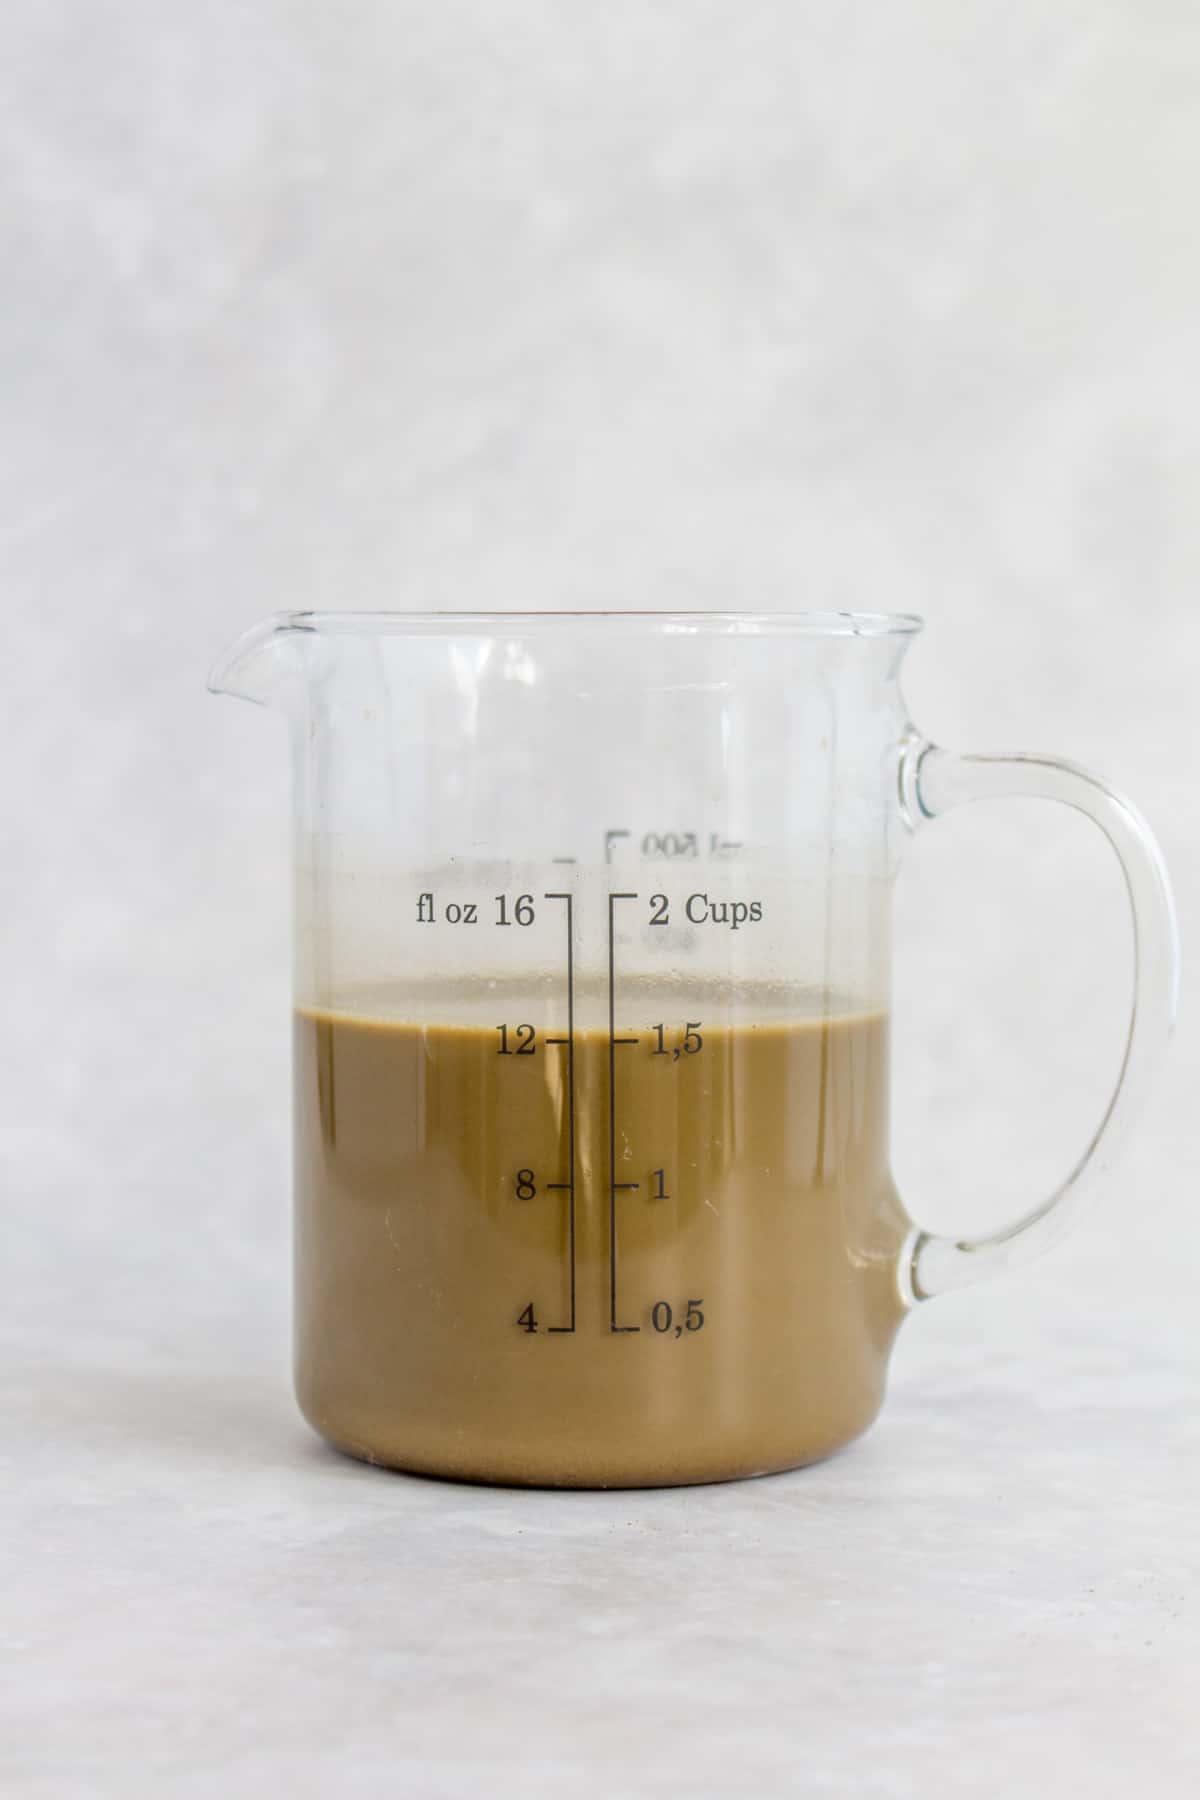 Hojicha mixture in a measuring cup.